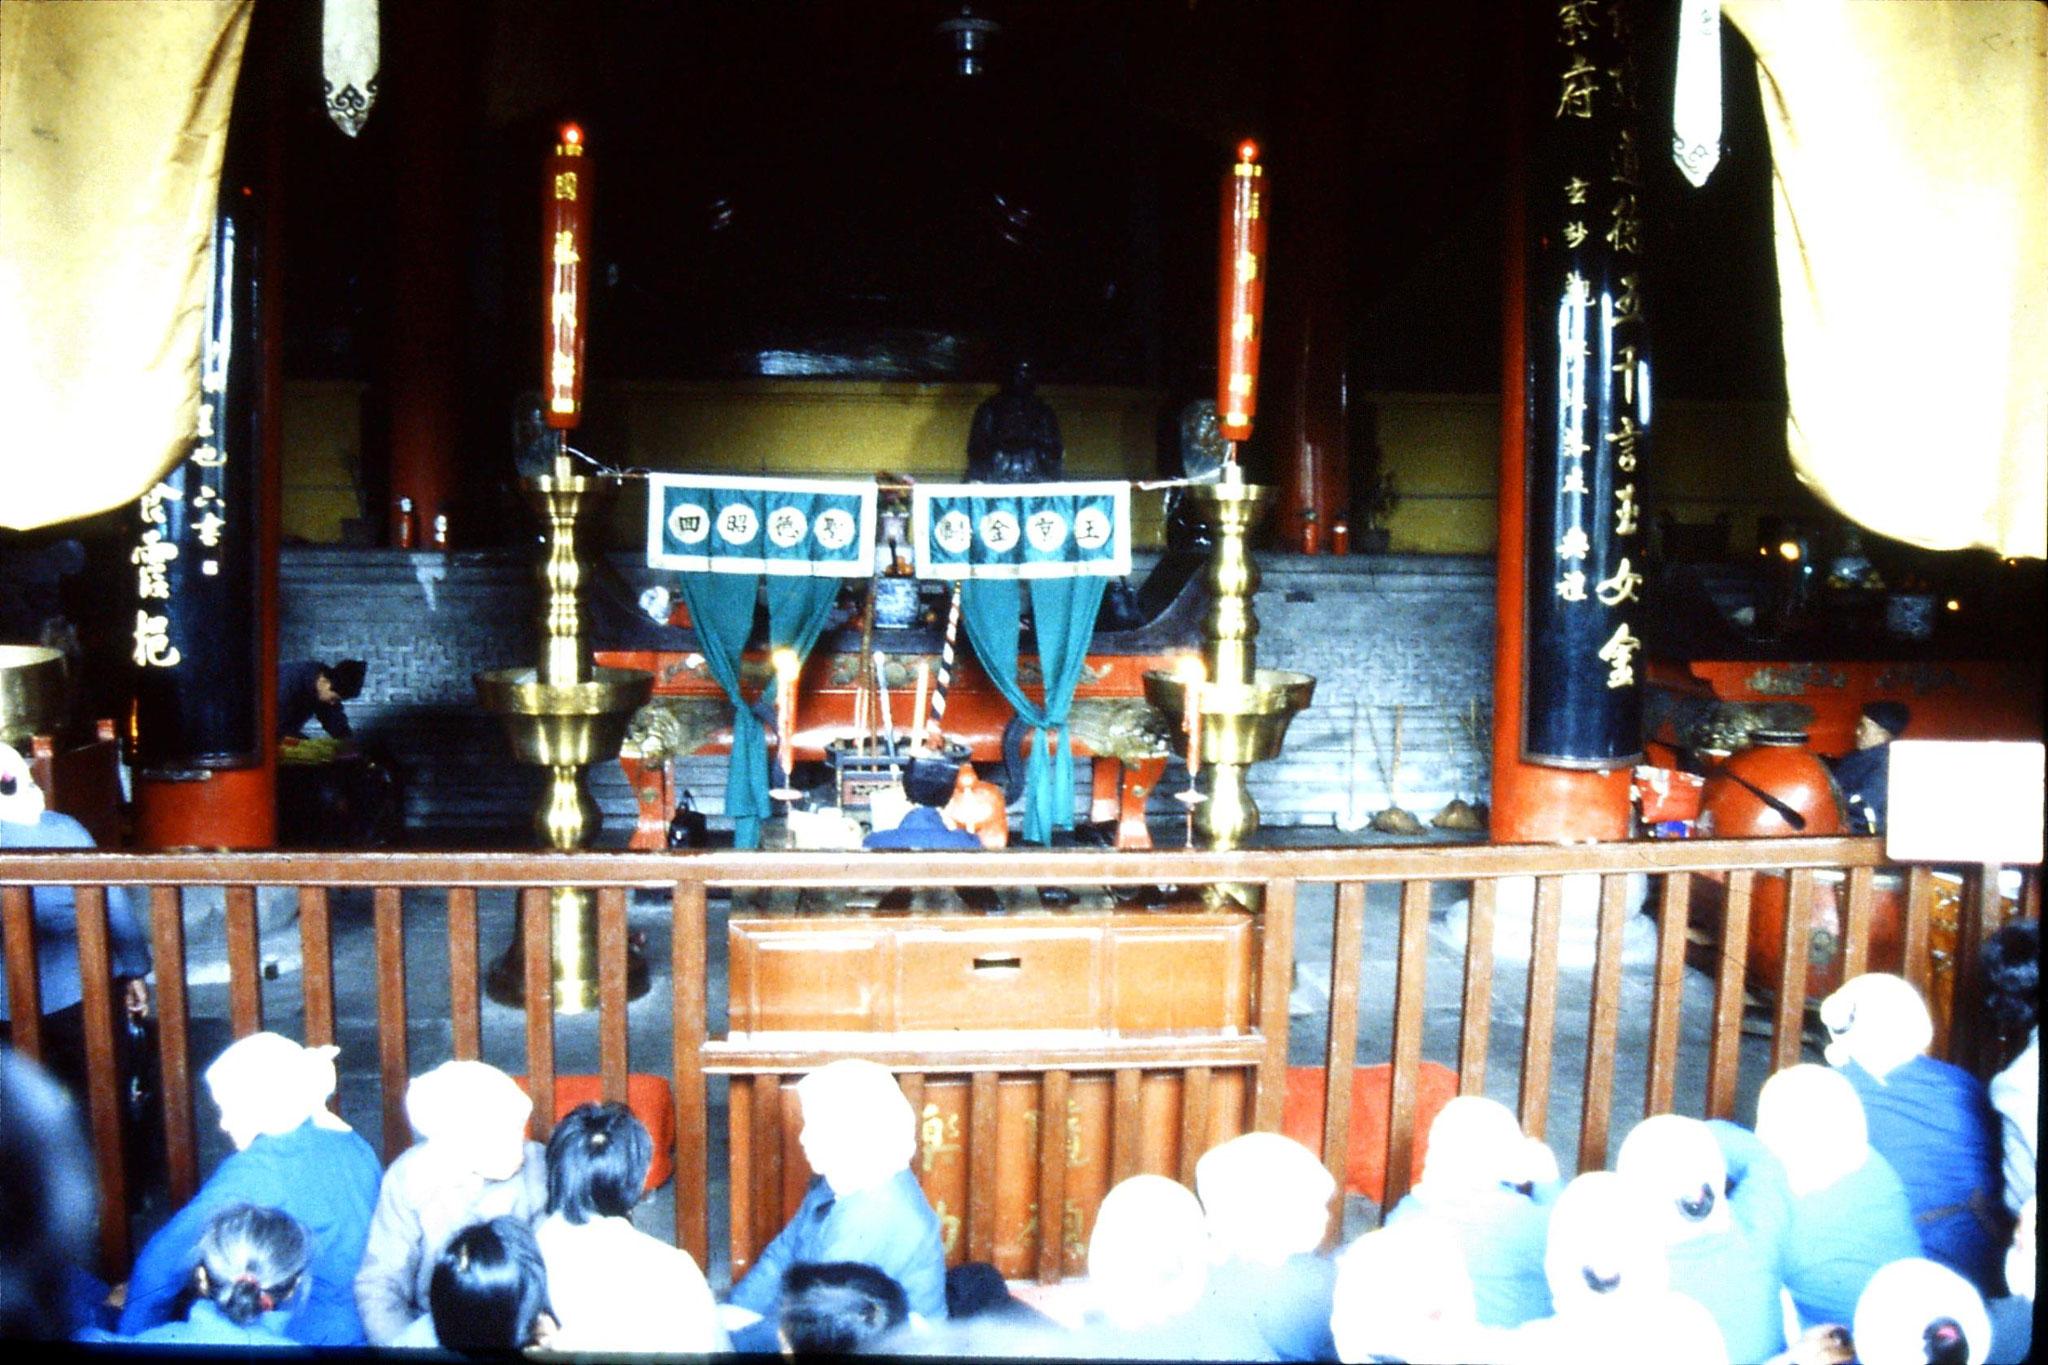 22/3/1989: 3: Suzhou: inside Wuanmiao Si temple